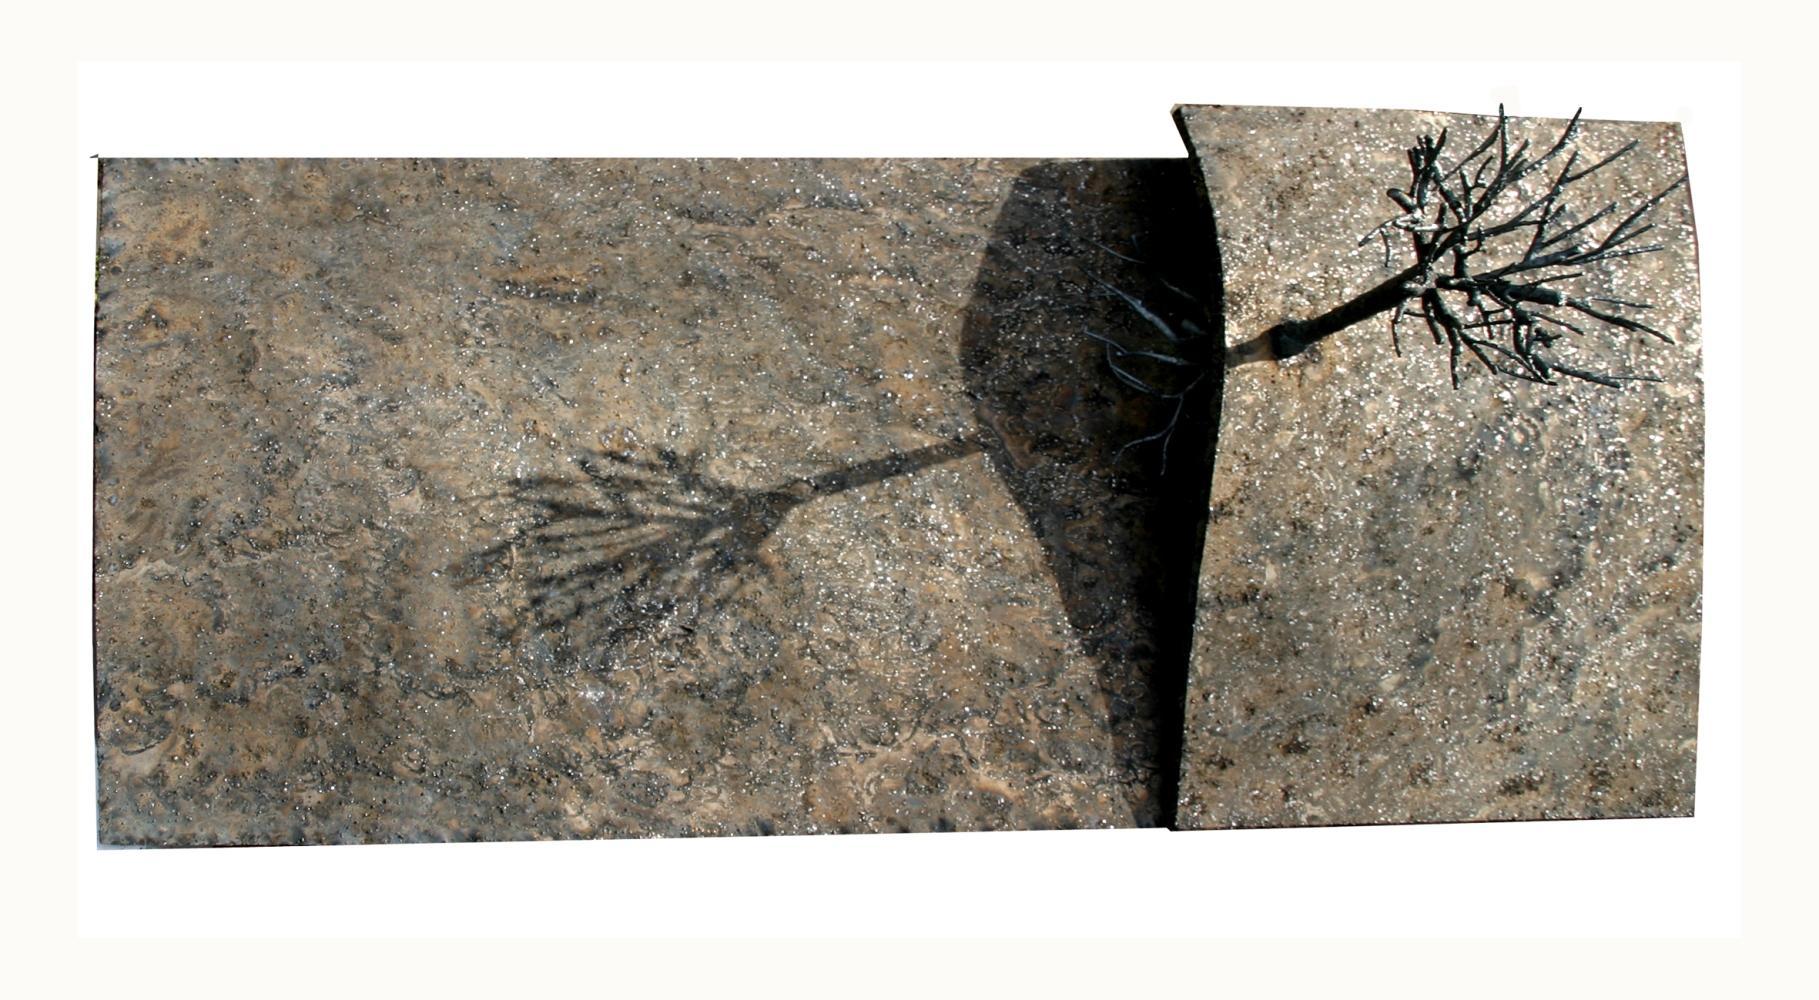 Roots #2 - Jean-Paul Réti, 21st Century, Contemporary metal sculpture